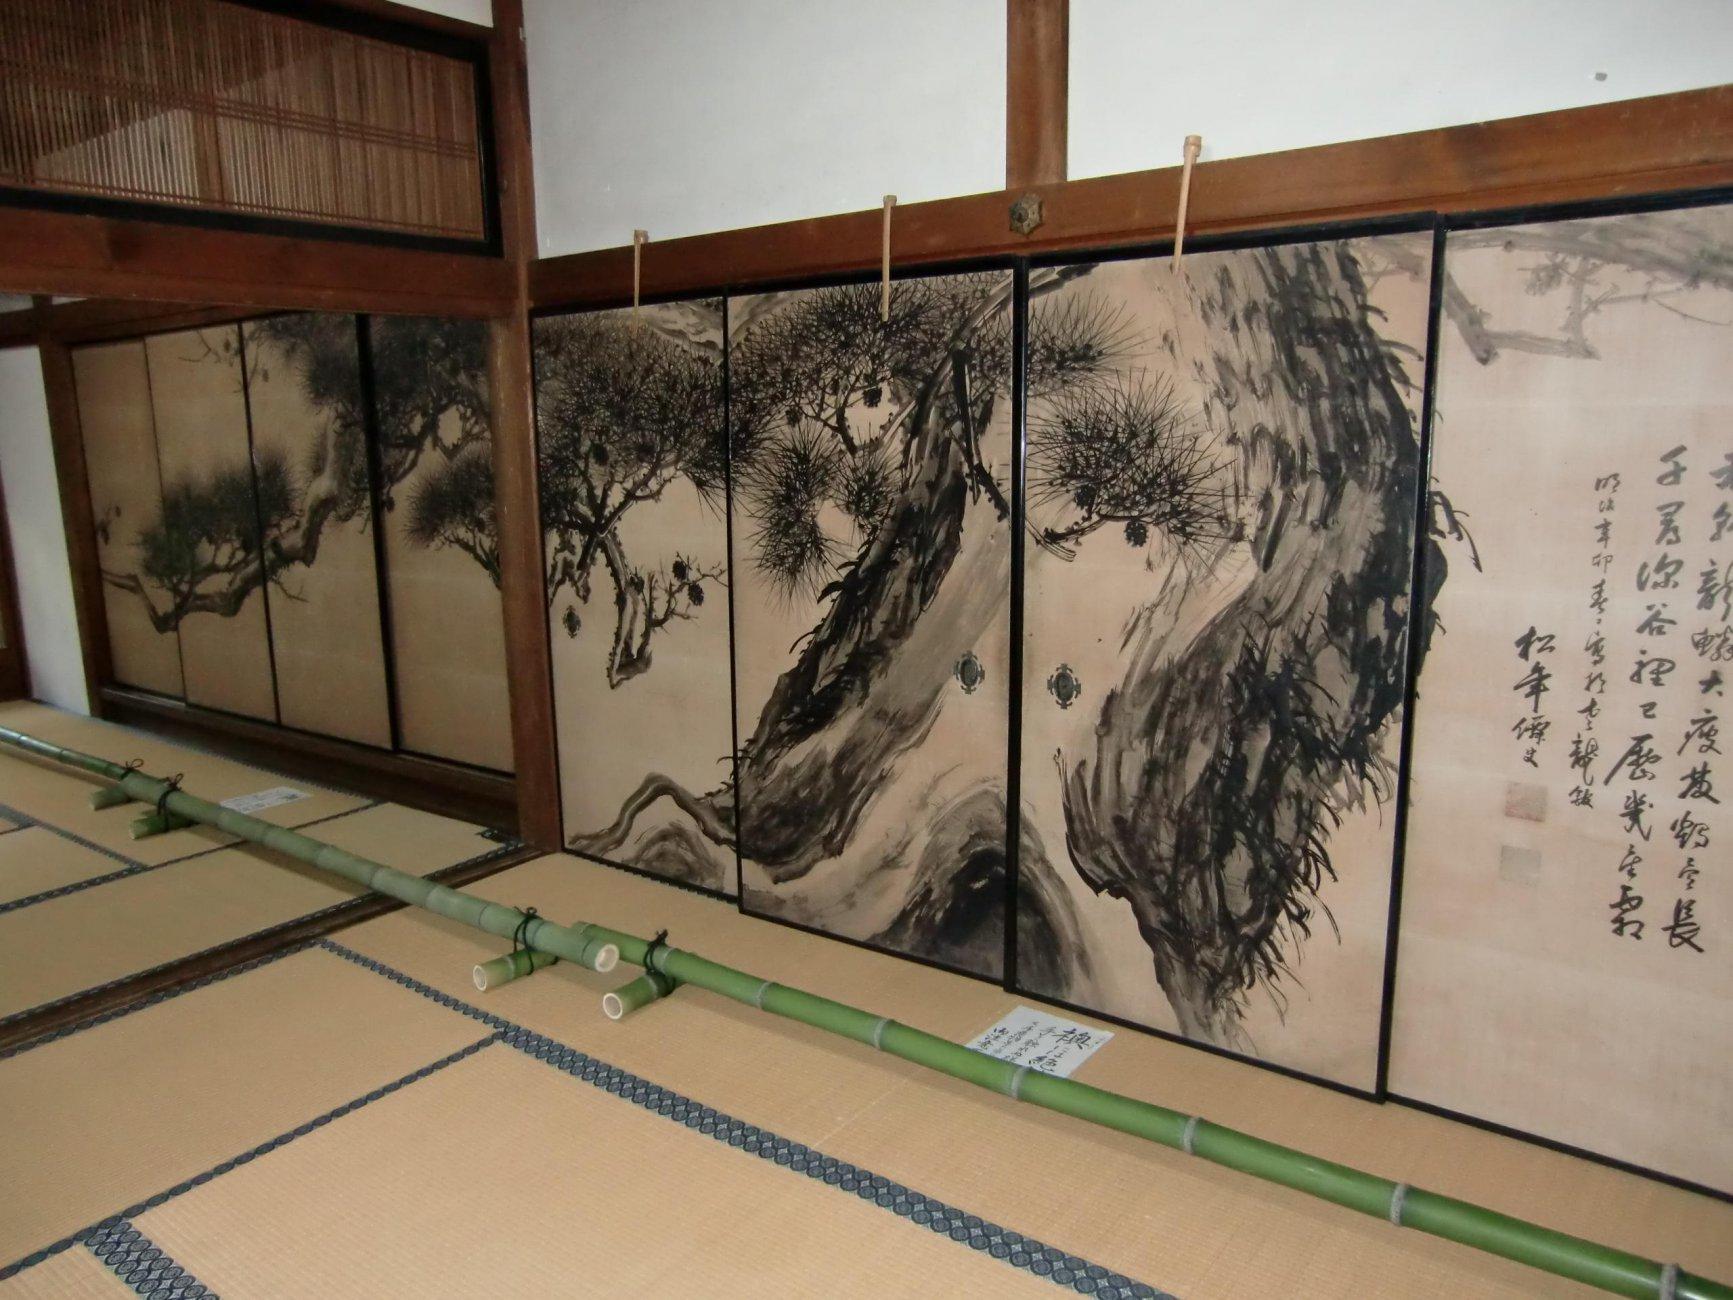 Судзуки Сёнен, Suzuki Shonen (1848 - 1918)126488598867116110583_CIMG3790.JPG